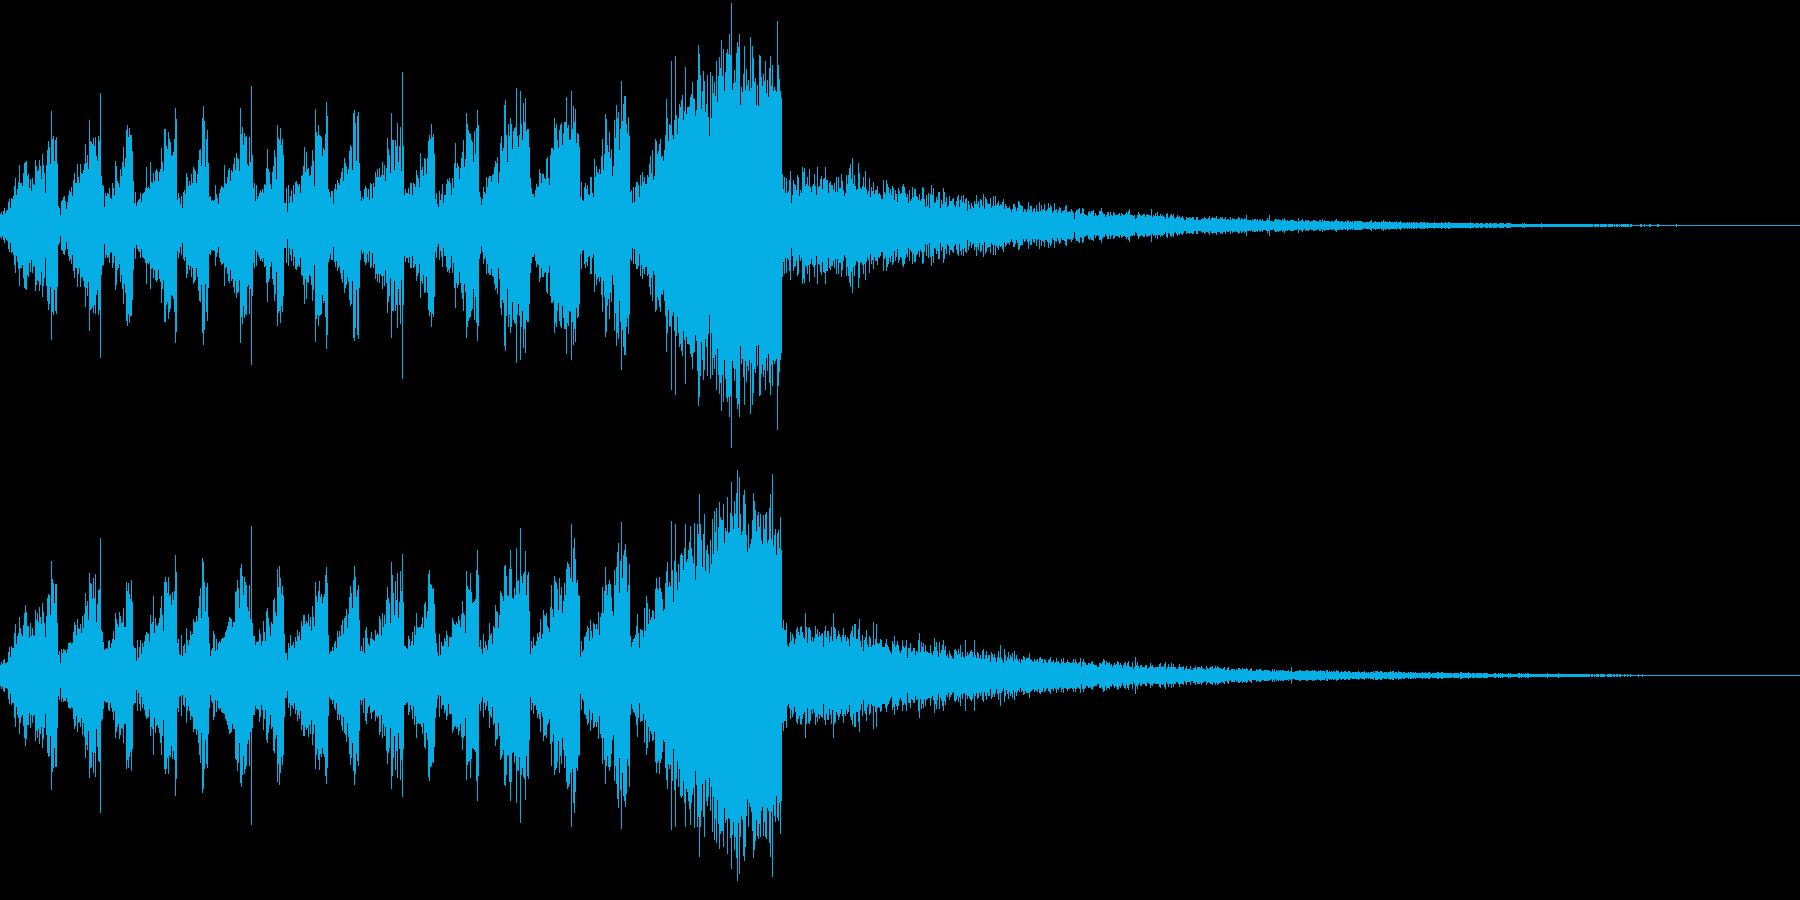 RadioSFX ランキング発表前SEの再生済みの波形